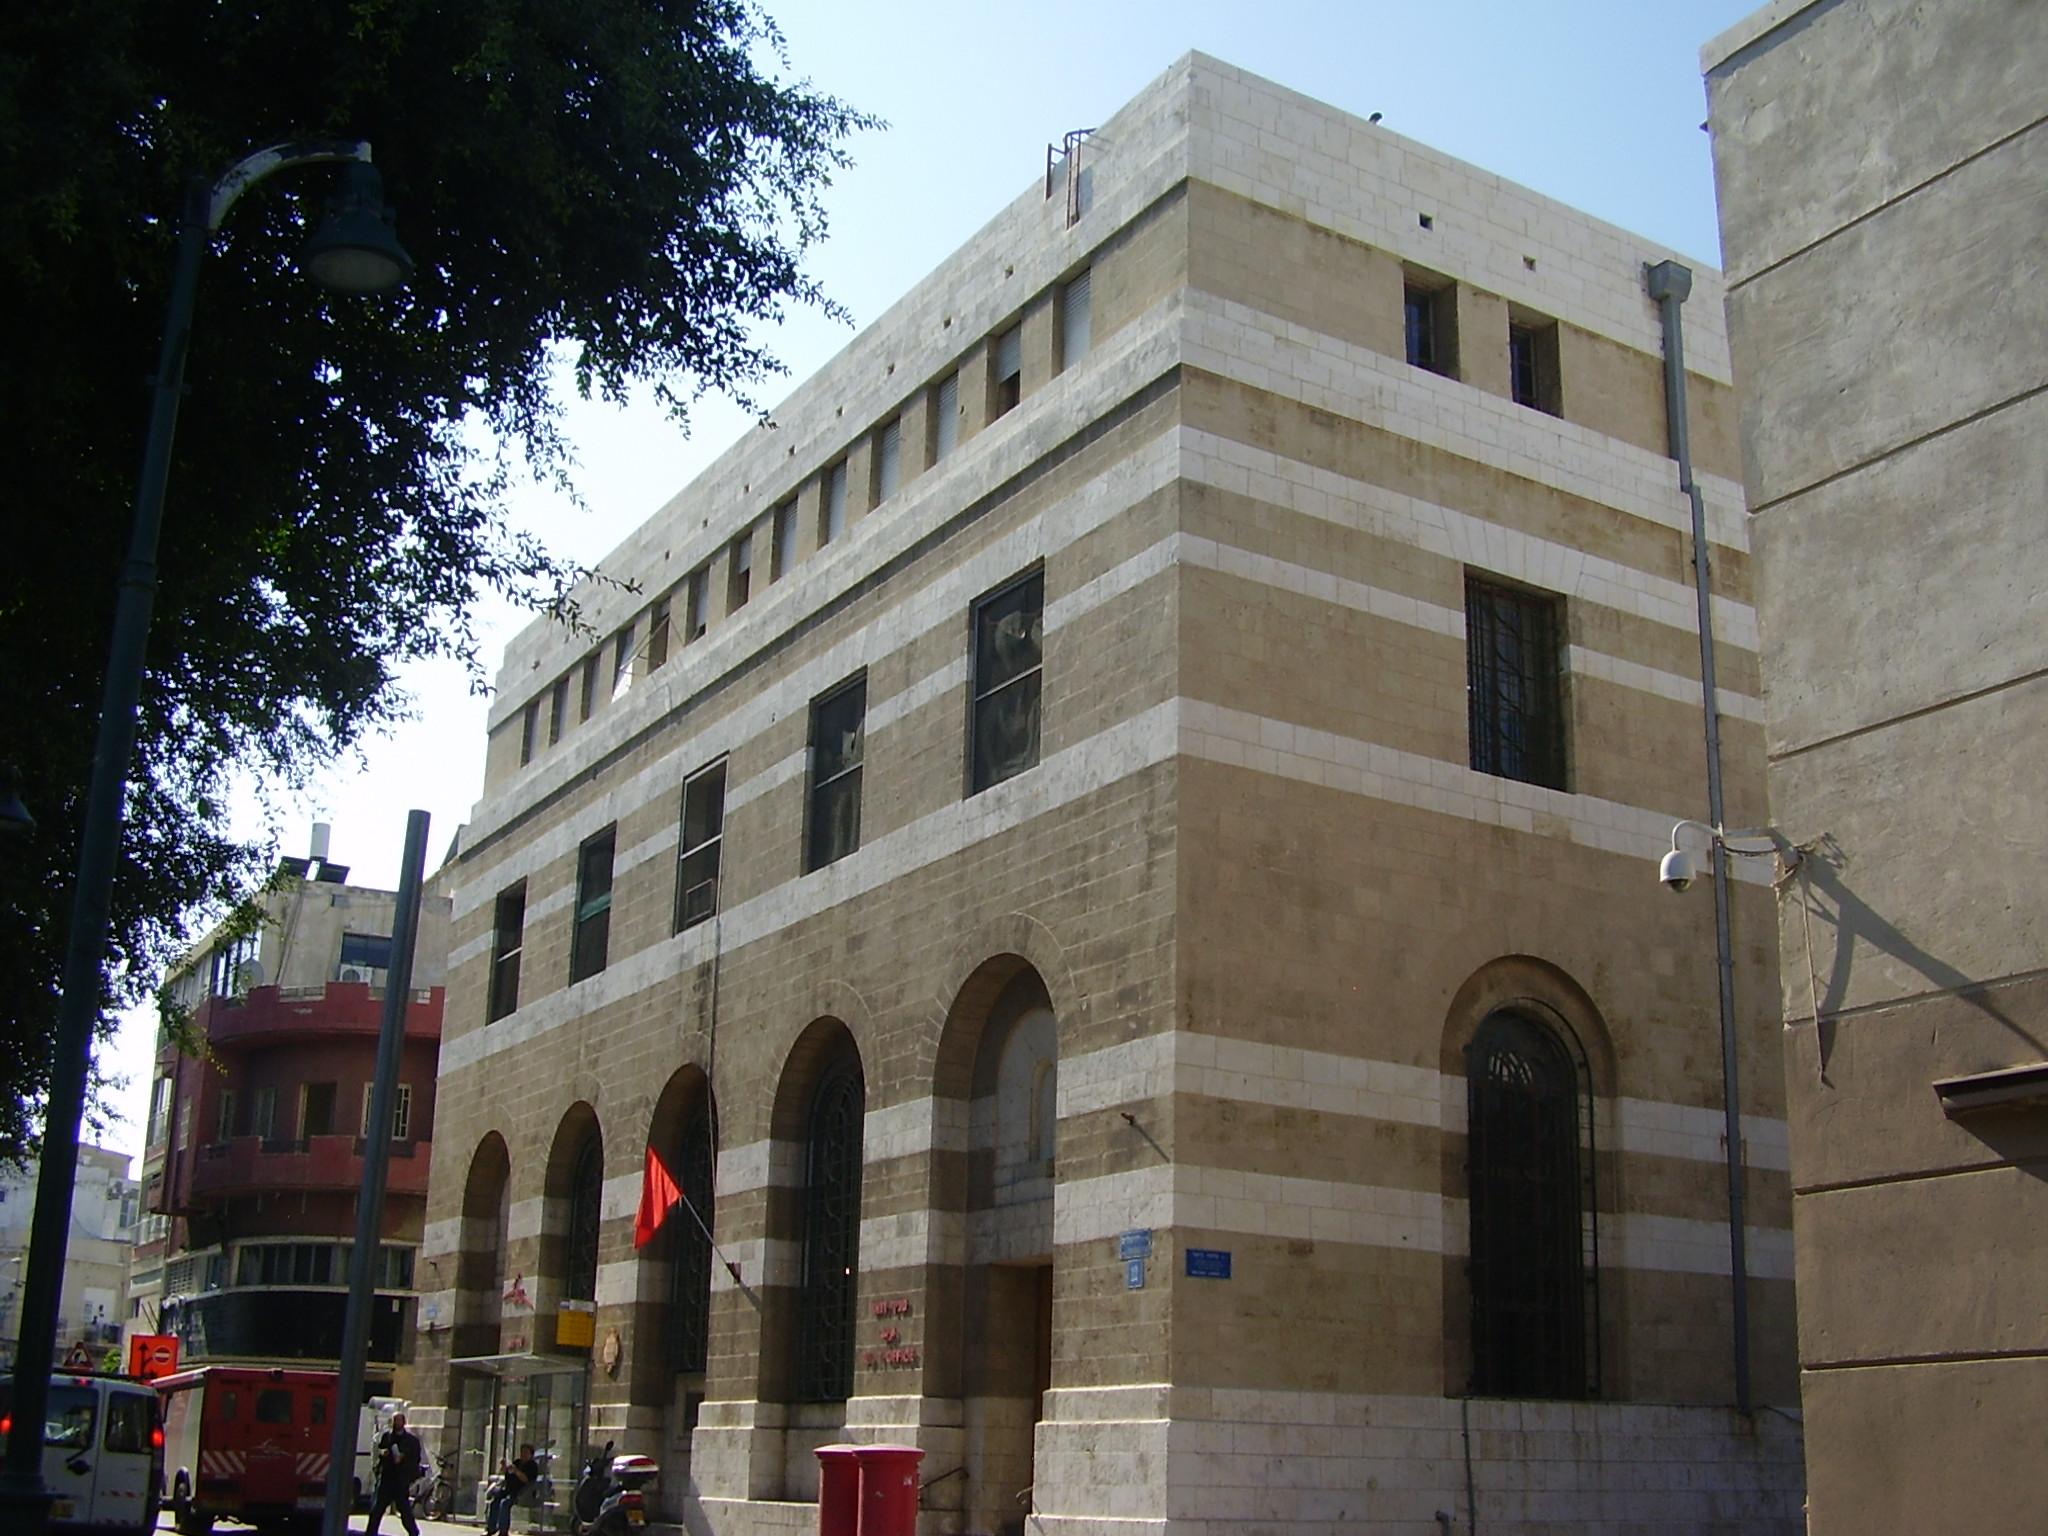 Central Post Office in Jaffa (Yaffo). Photo taken on November 23, 2011